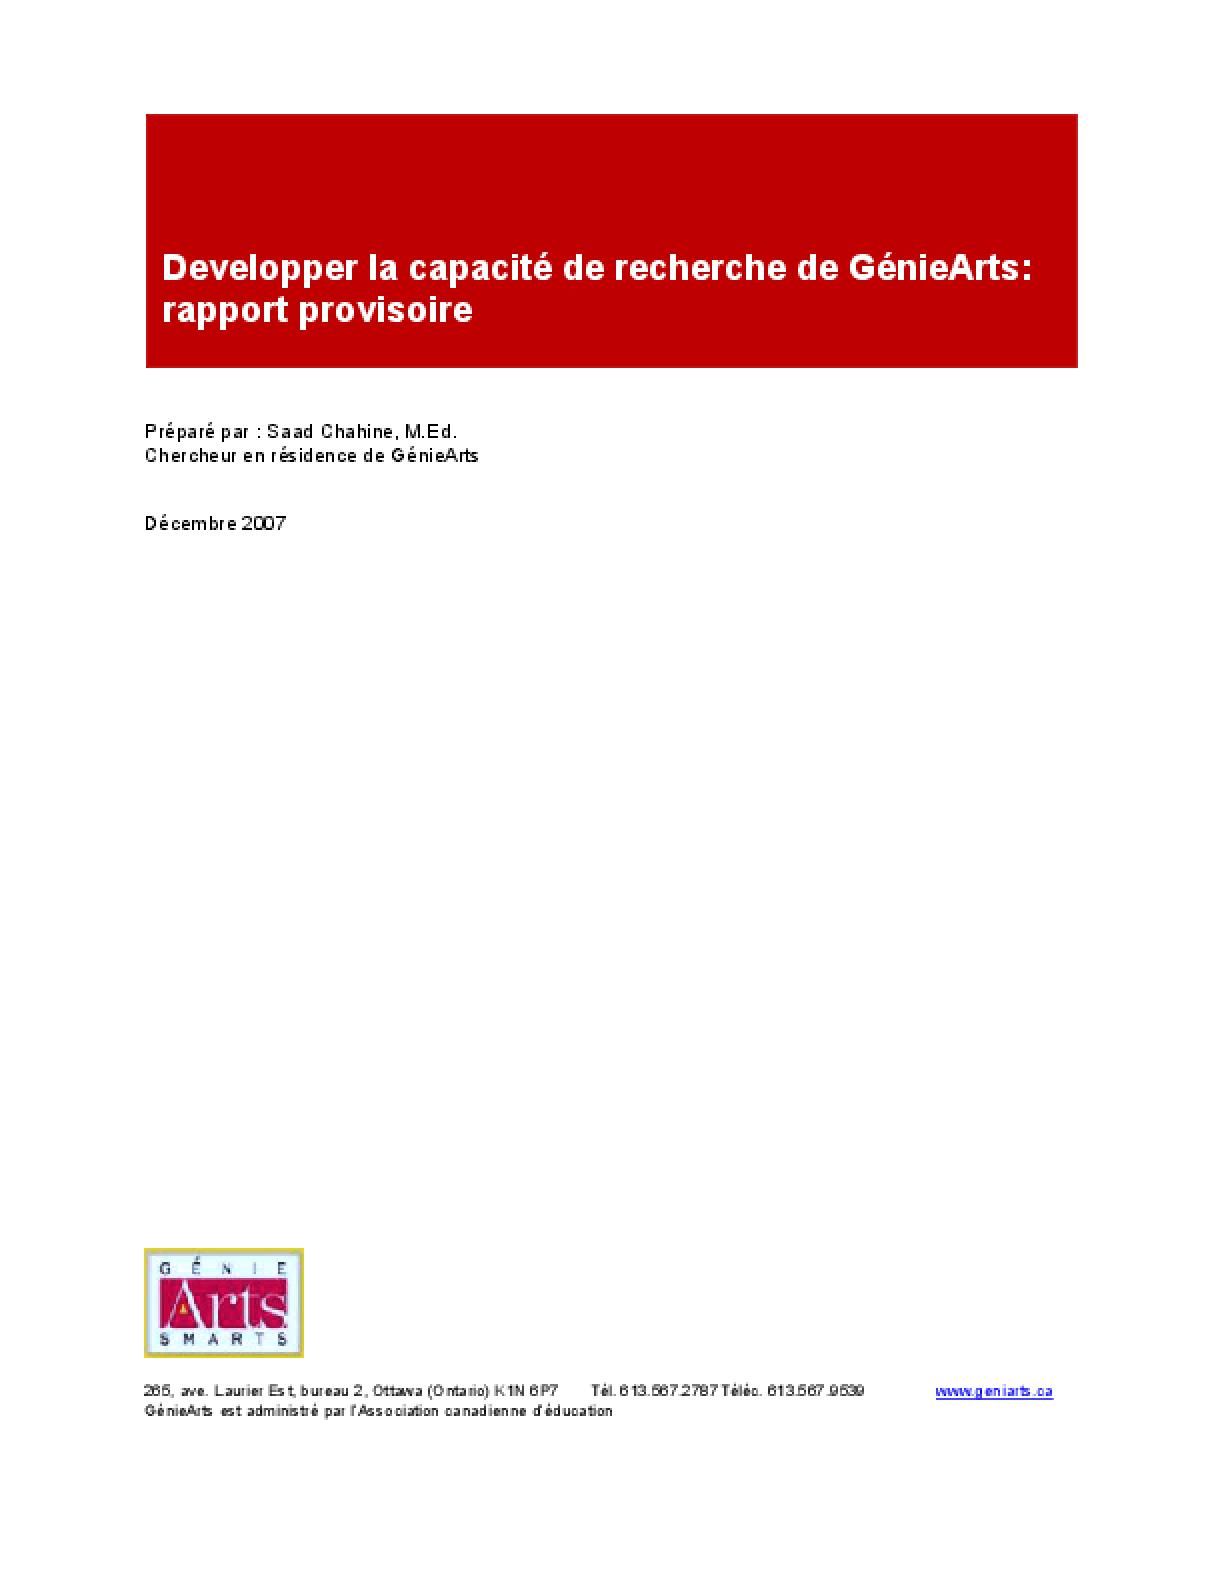 Developper la capacite de recherche de GenieArts: rapport provisoire